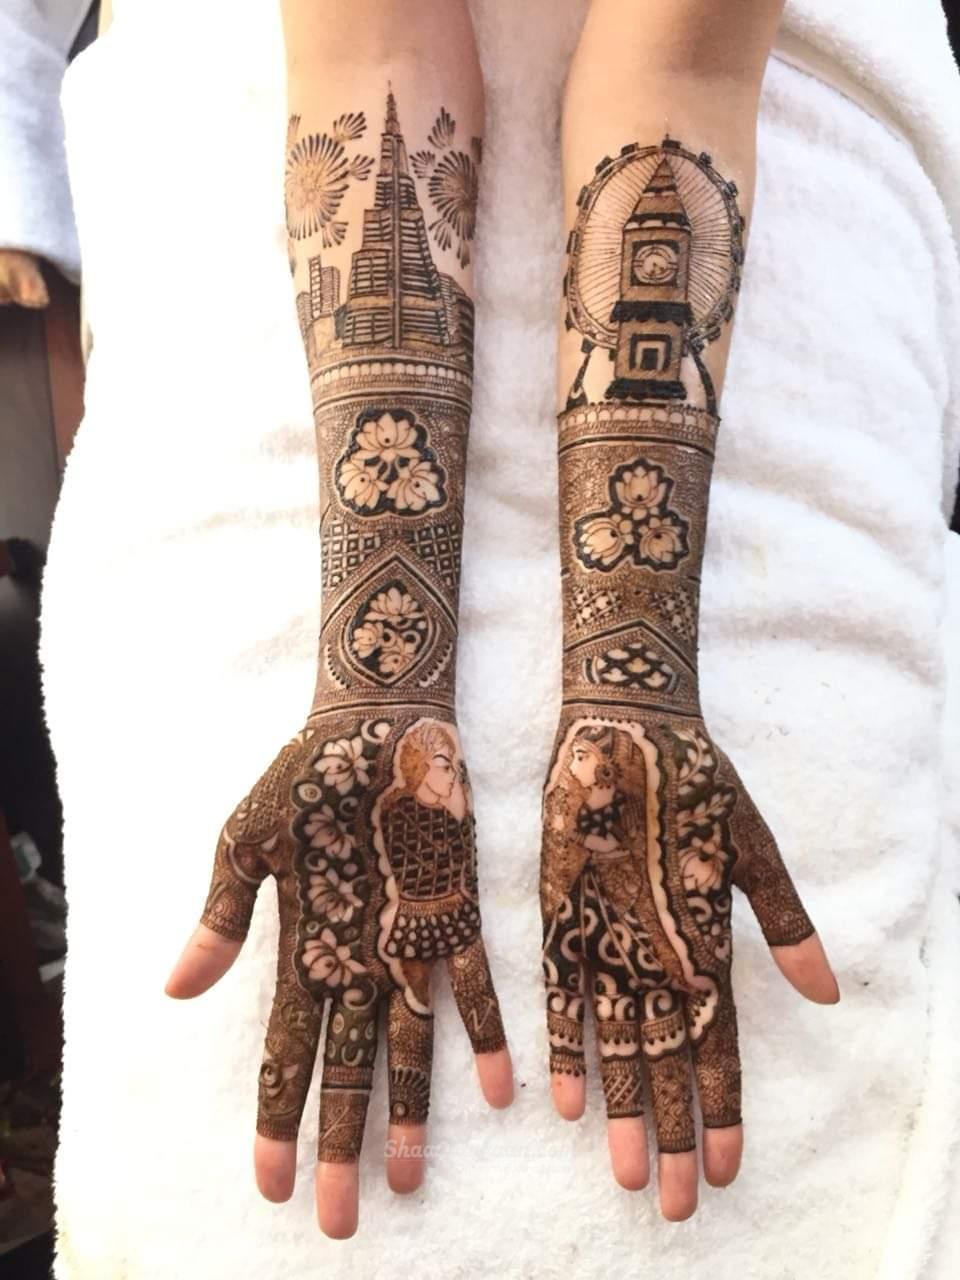 Mehndi Design Rose Mehndi Designs Bridal Mehndi Designs Wedding Mehndi Designs